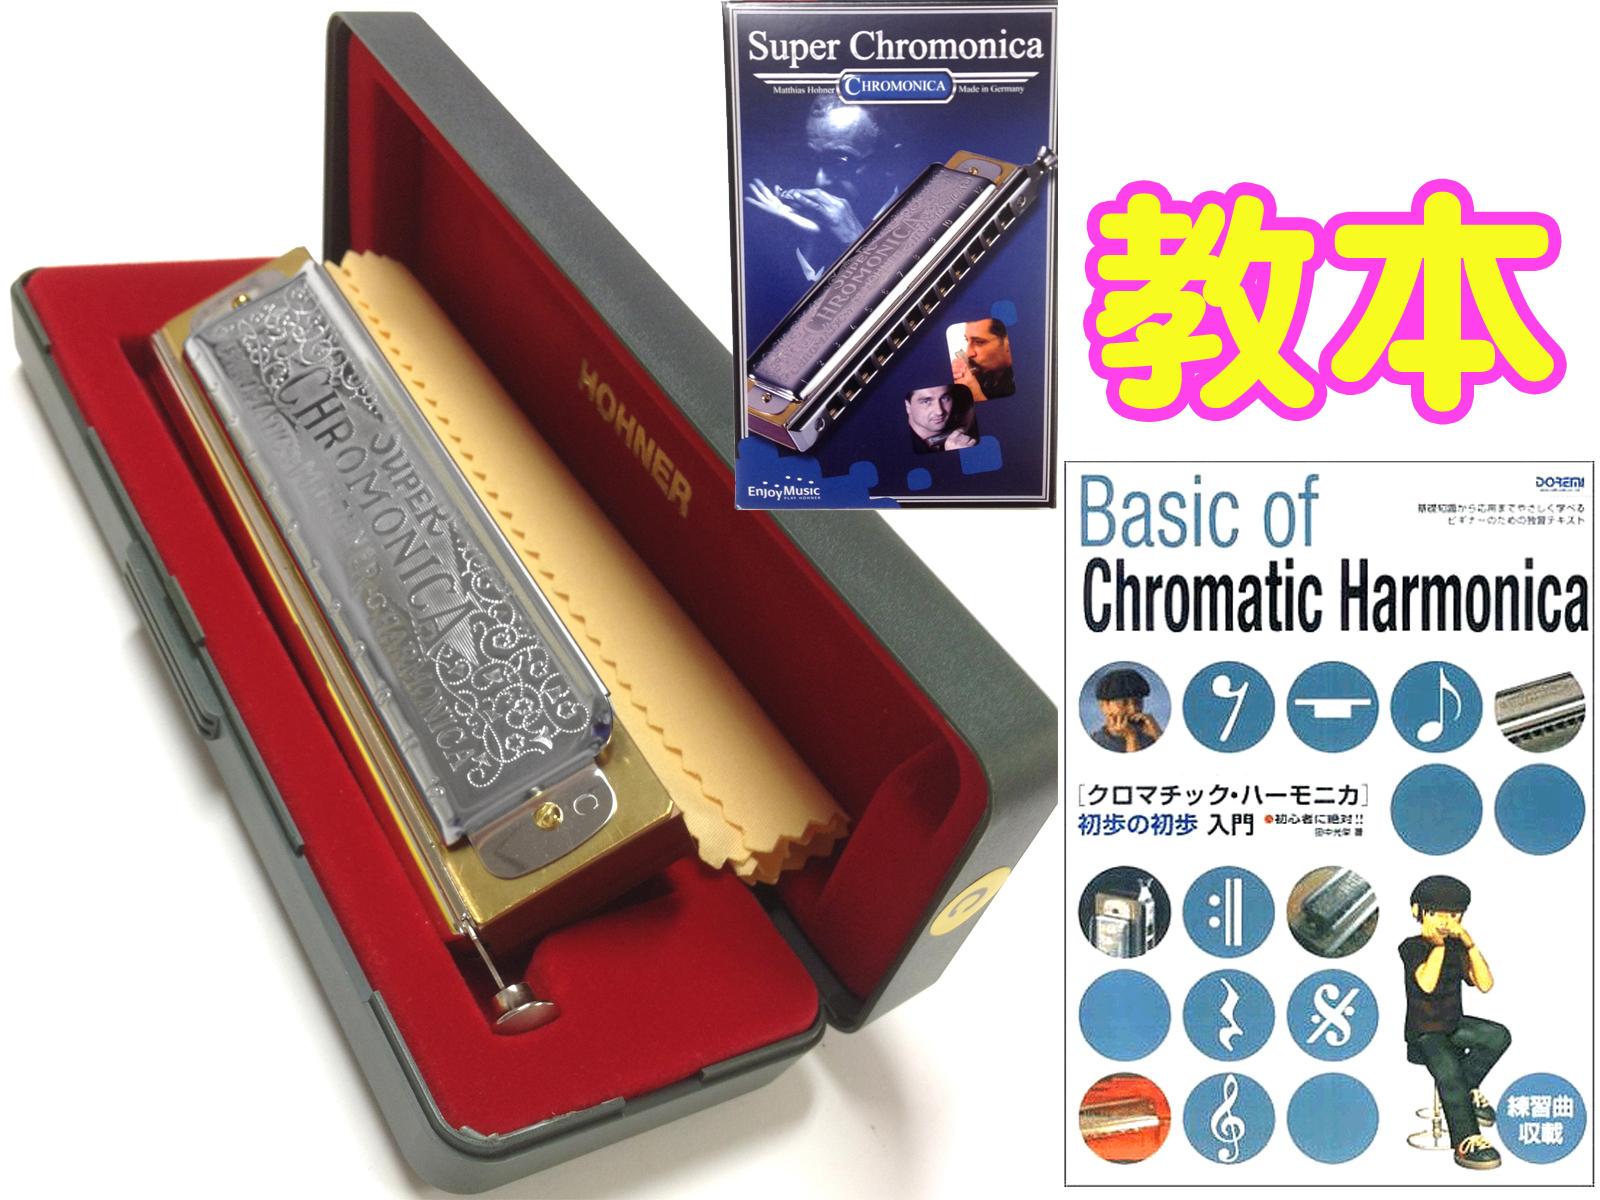 HOHNER ( ホーナー ) 初心者 クロマチックハーモニカ セット Super Chromonica 270 + 教本 3オクターブ 12穴 C調 スーパー クロモニカ270 楽器 【 270/48 初歩 】